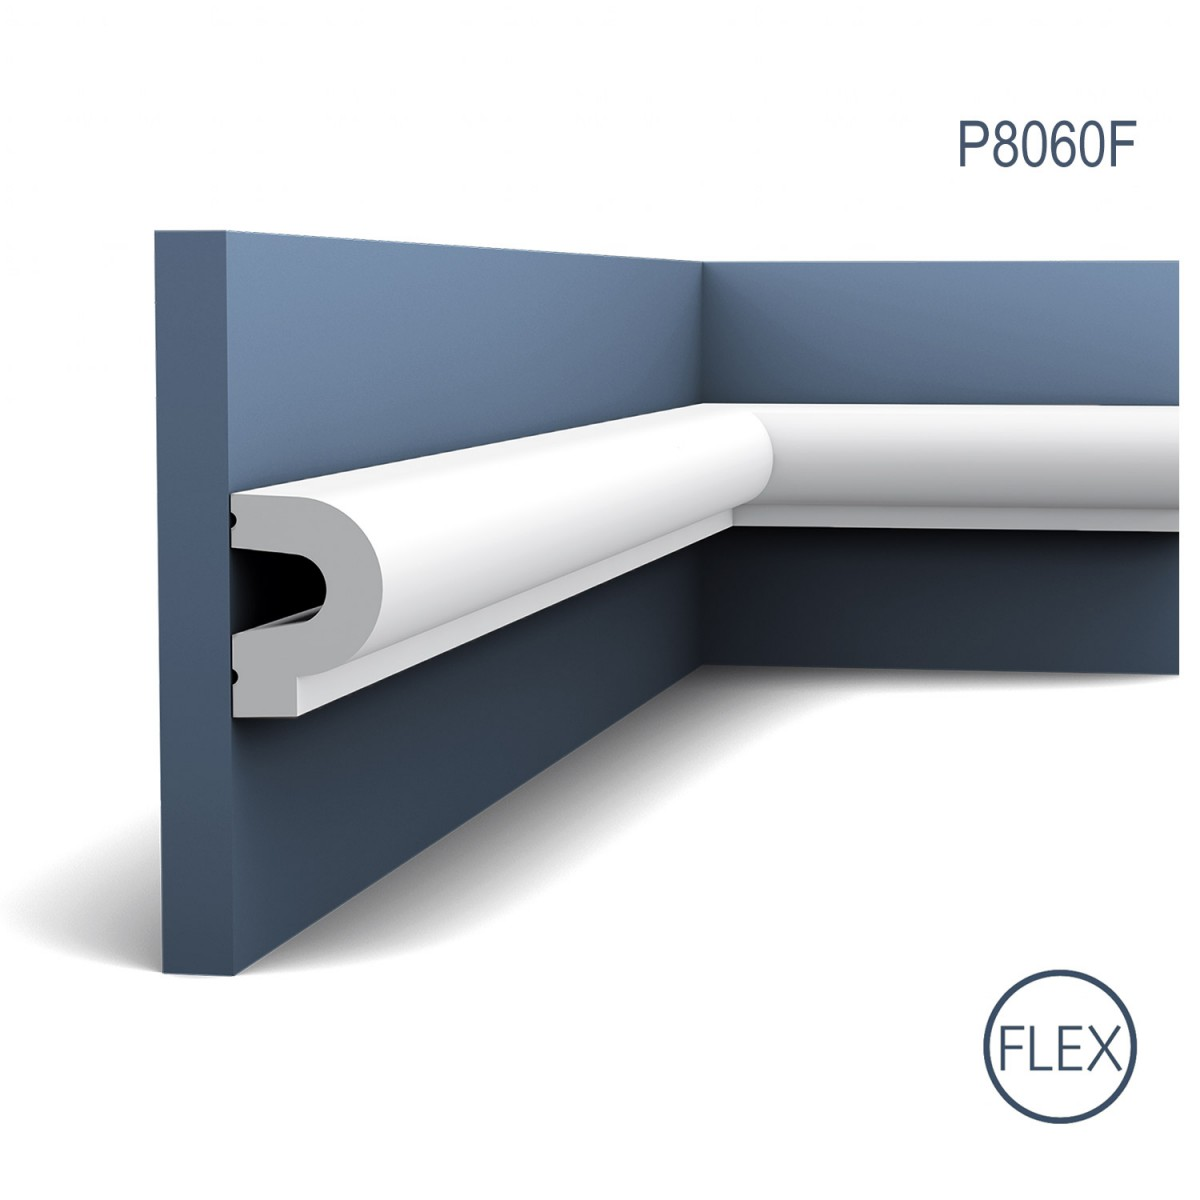 Brau Flex Luxxus P8060F, Dimensiuni: 200 X 5 X 3.5 cm, Orac Decor